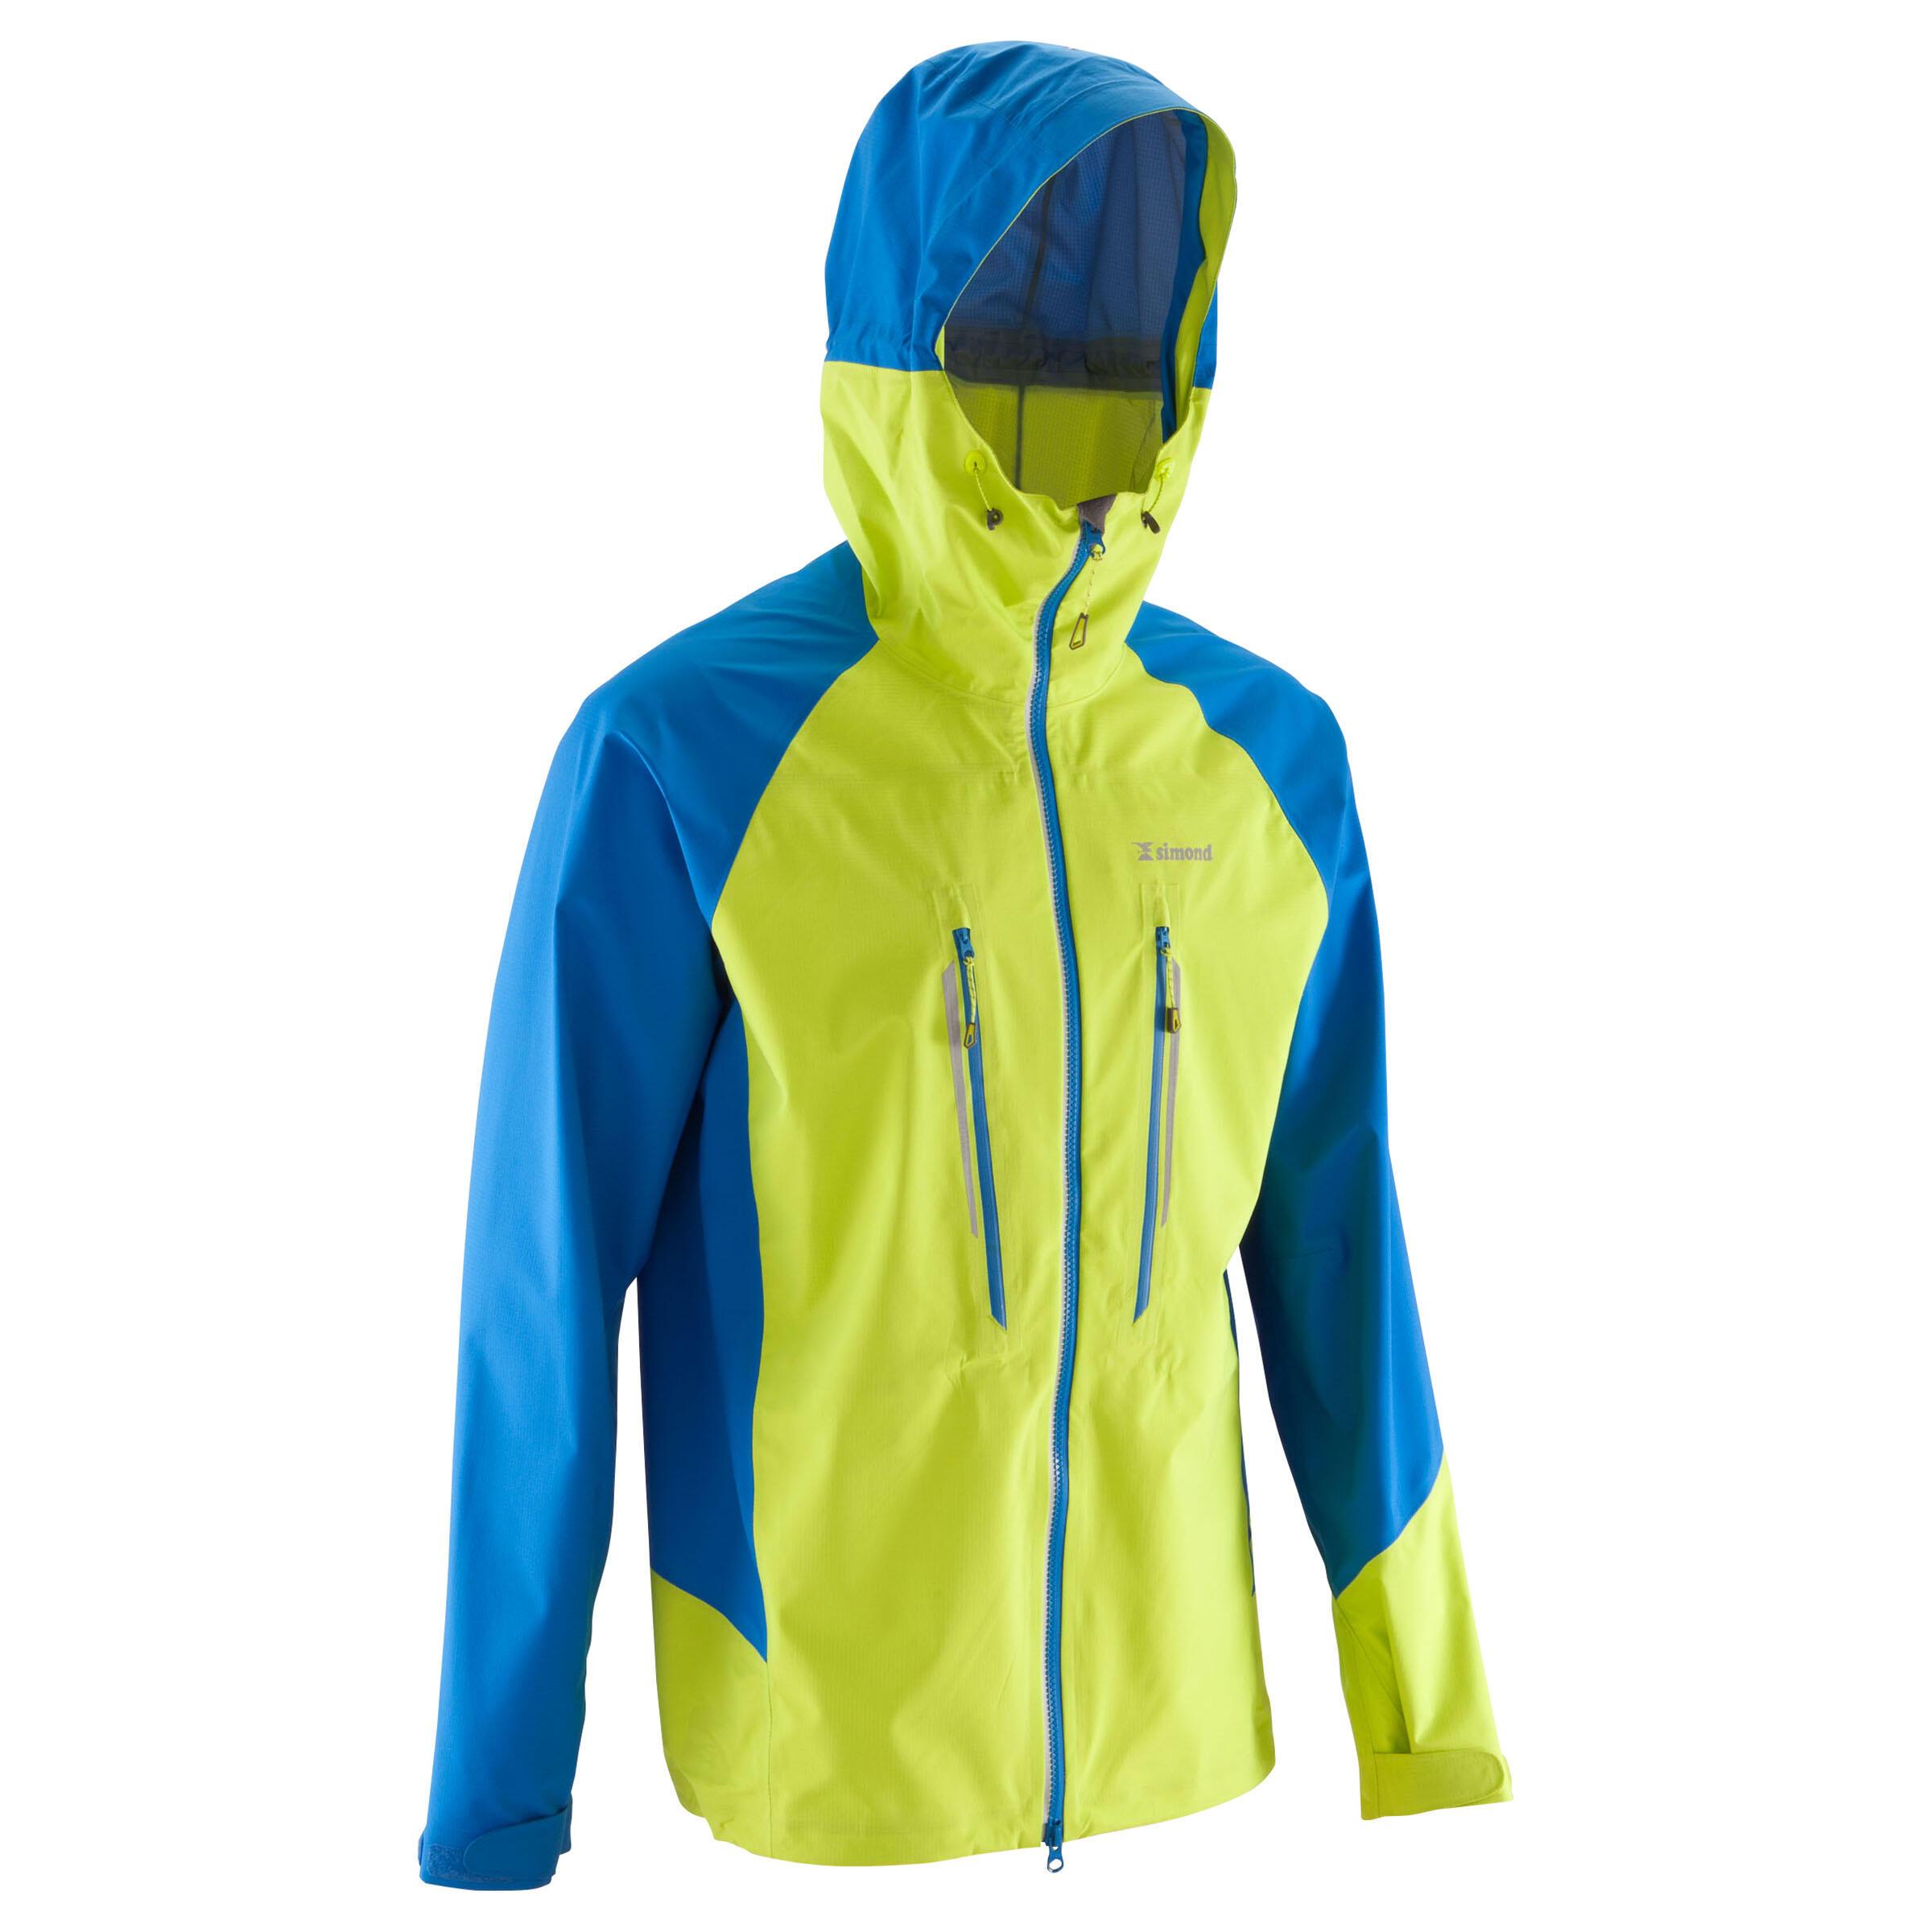 Men's Mountaineering Light Jacket - Blue